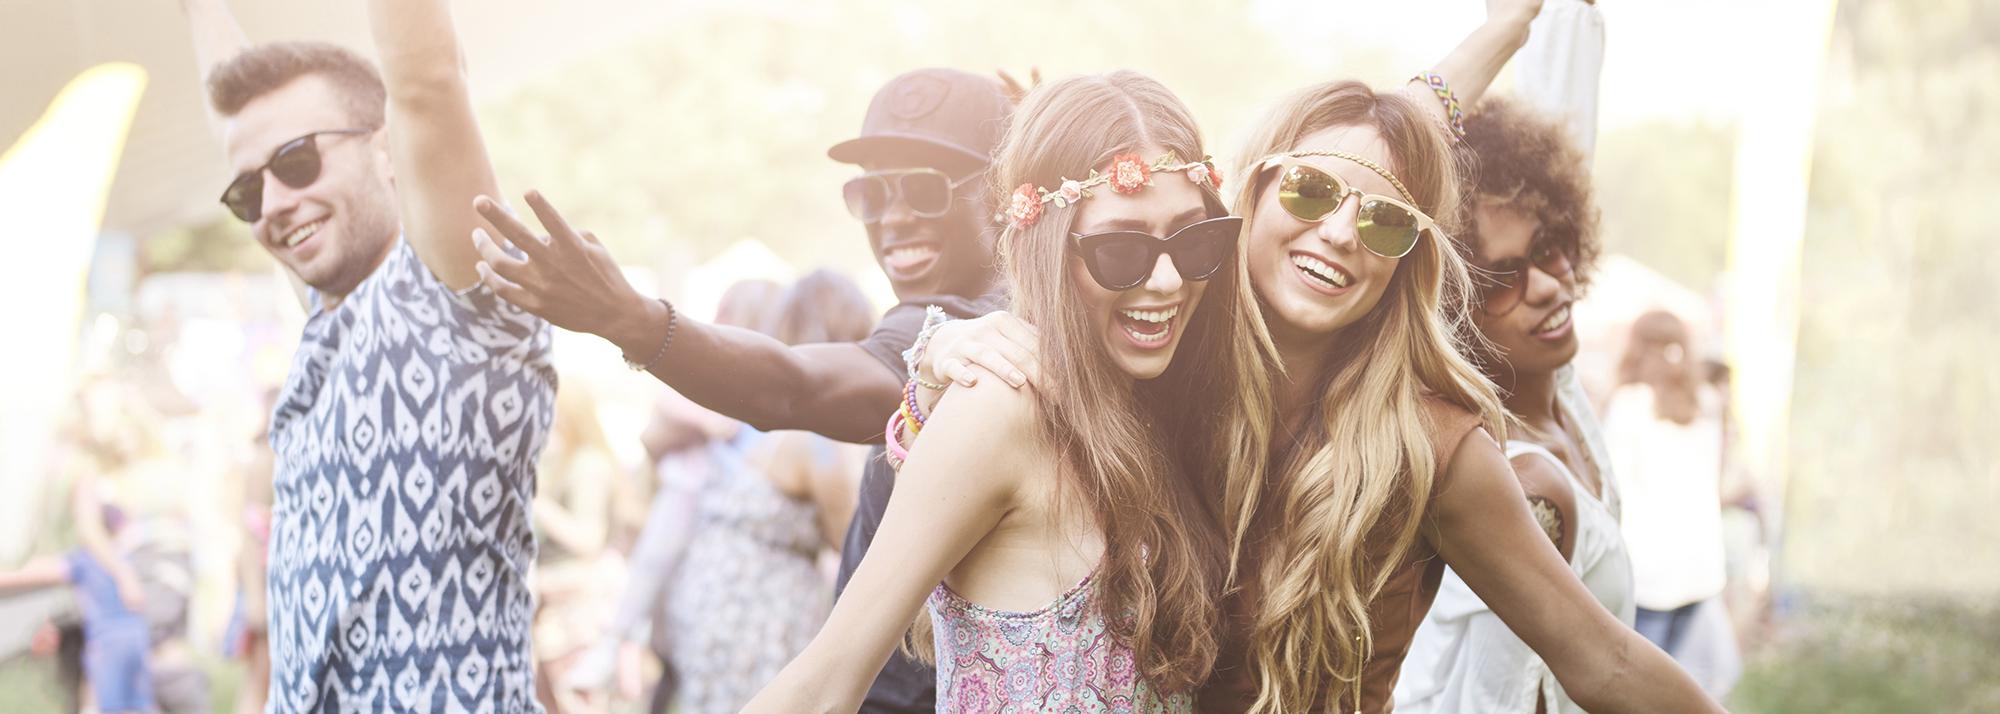 Summer-filled Summer Festivals